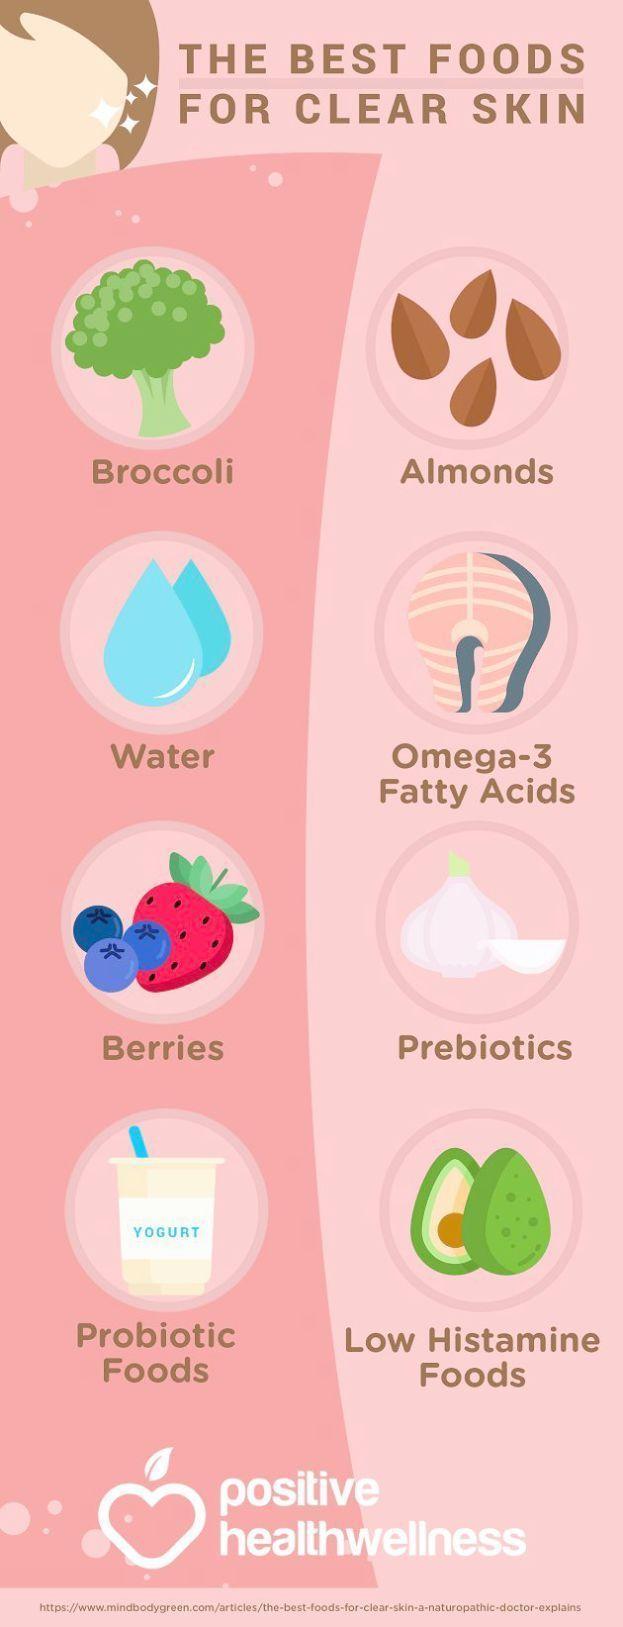 Pin By M A L I C I A On A F A I R E Foods For Clear Skin Clear Skin Diet Skin Food